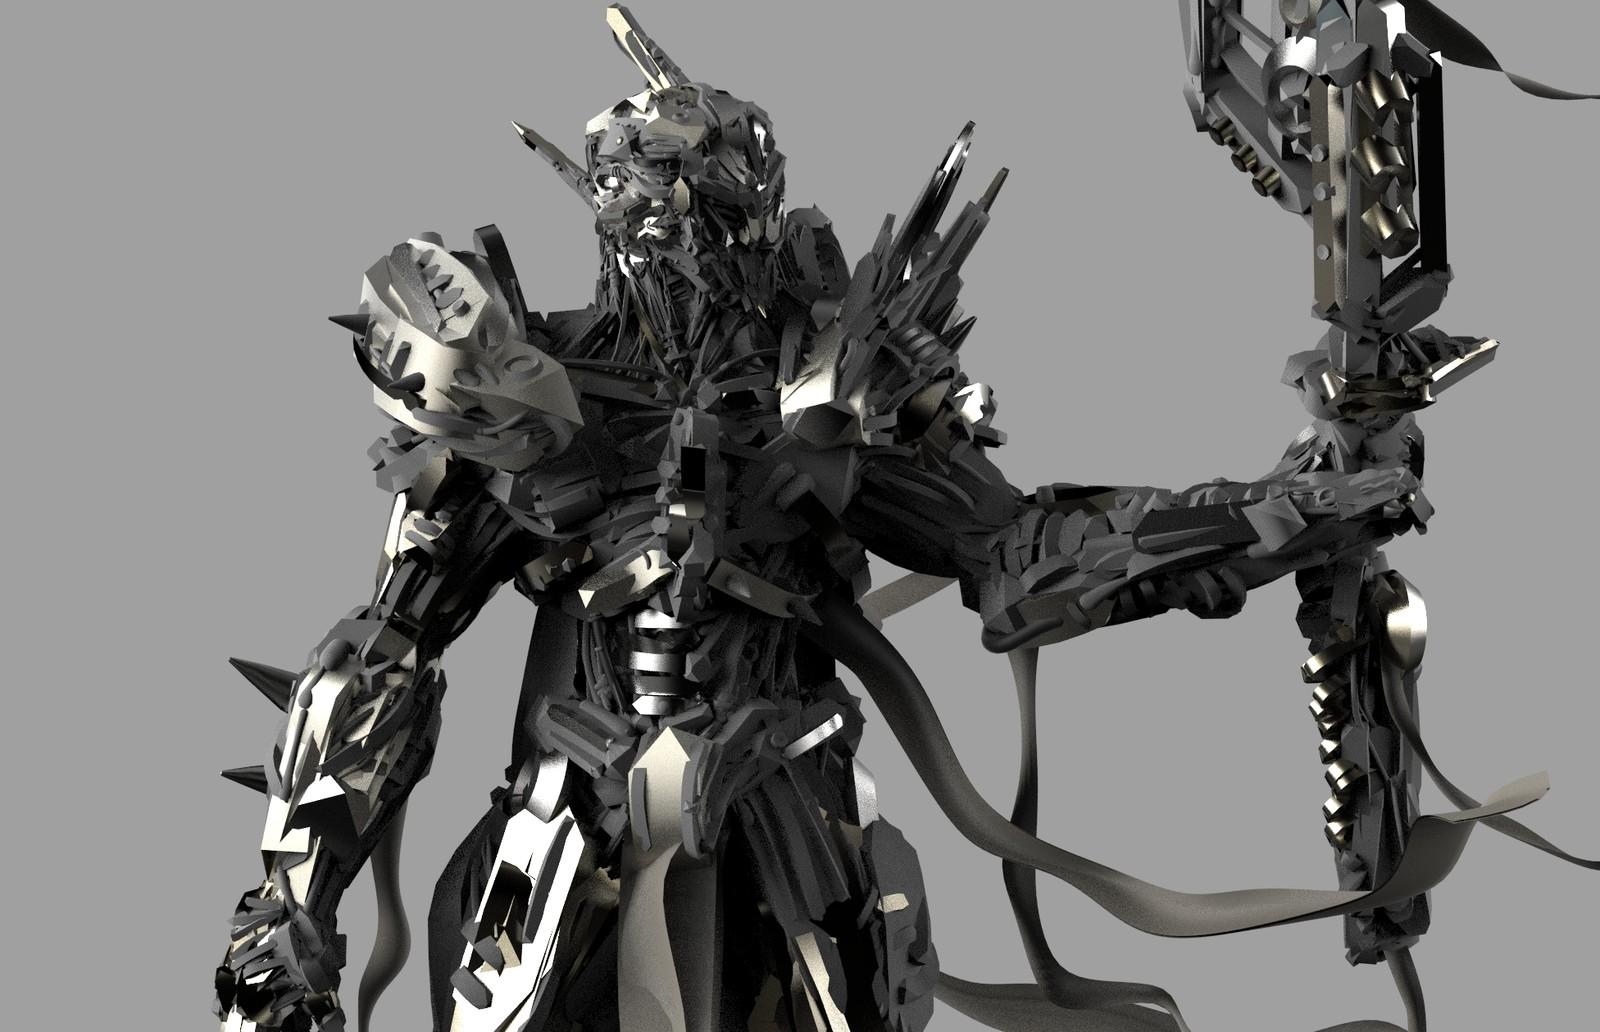 Tech Warrior VR design /Gravity sketch